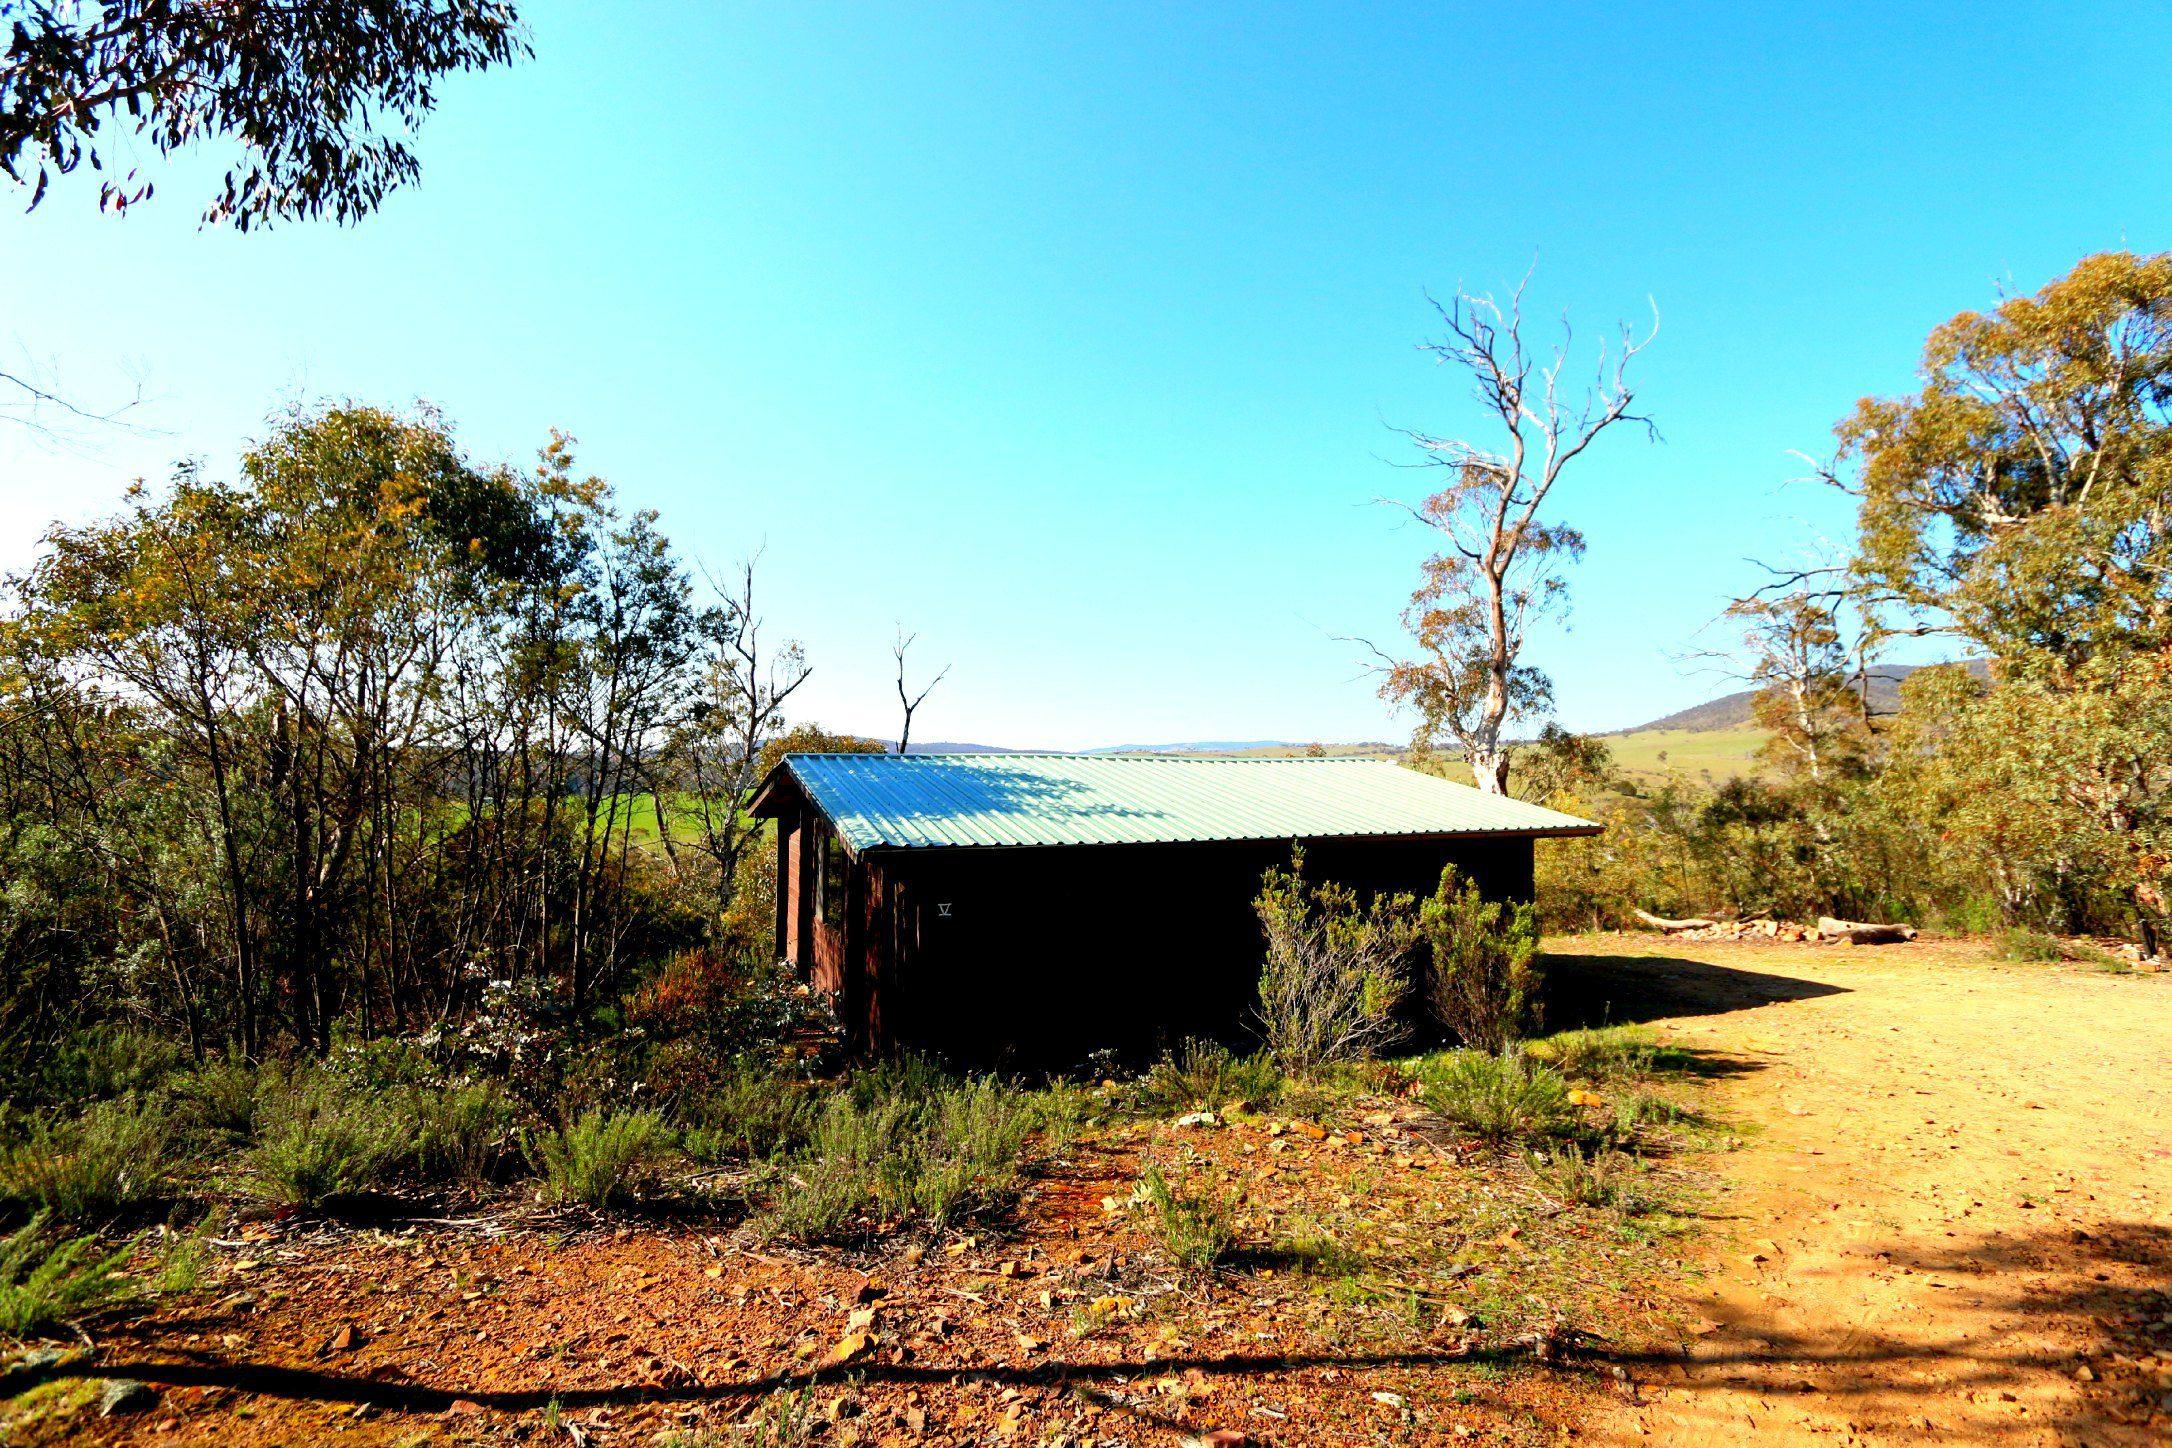 Snowy River Cabins, near Jindabyne Australia